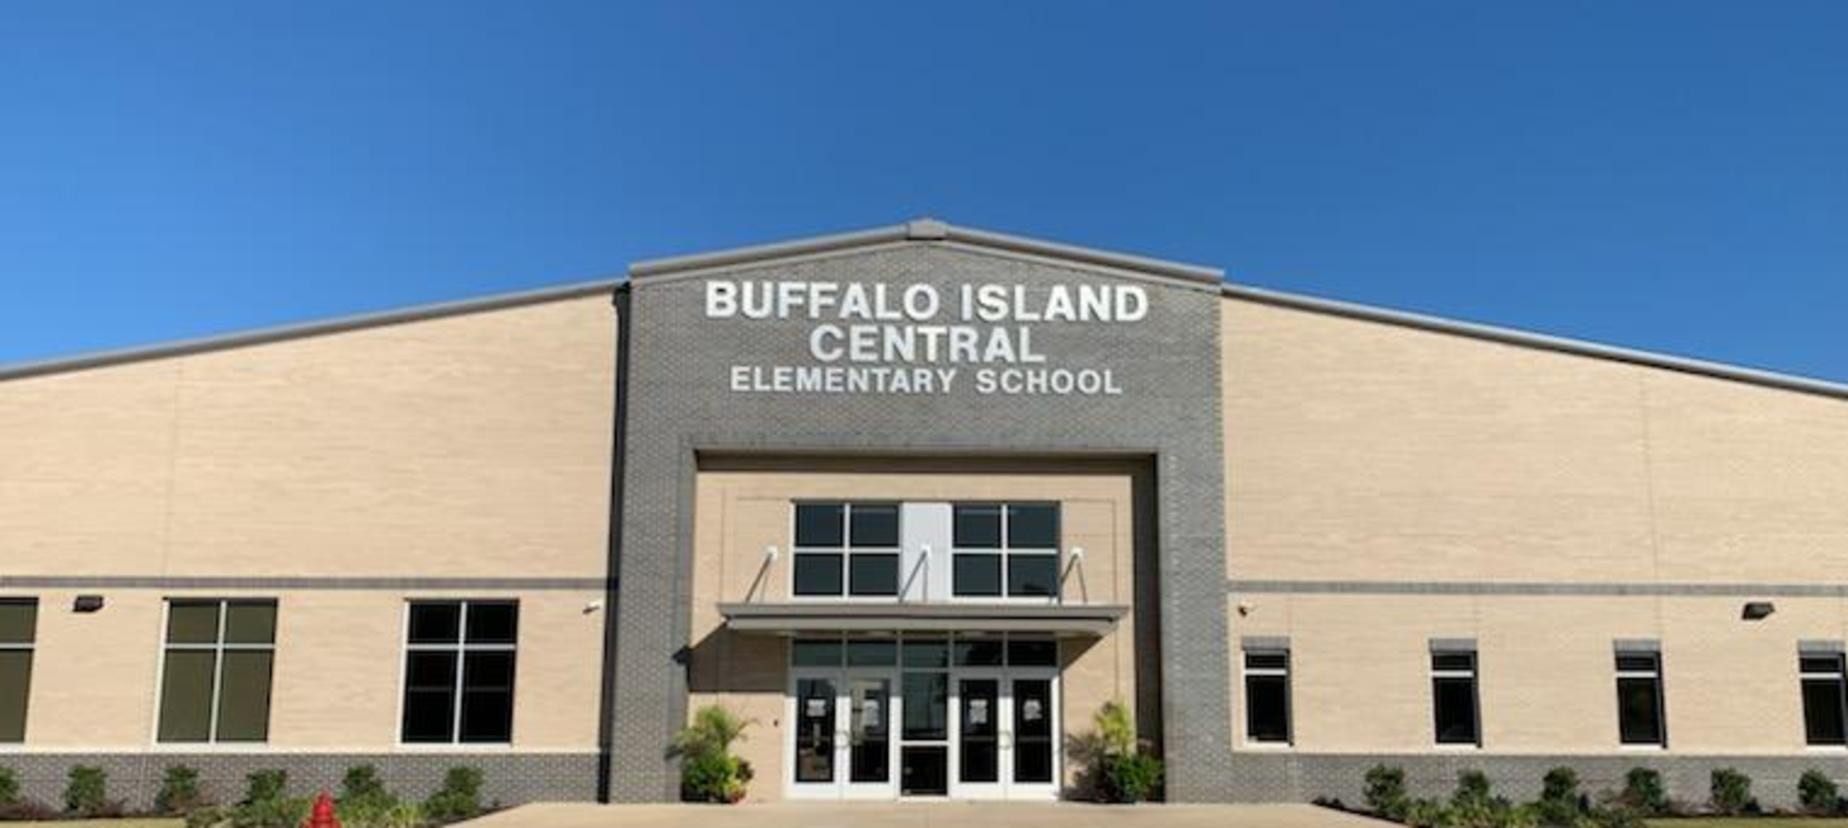 BIC Elementary